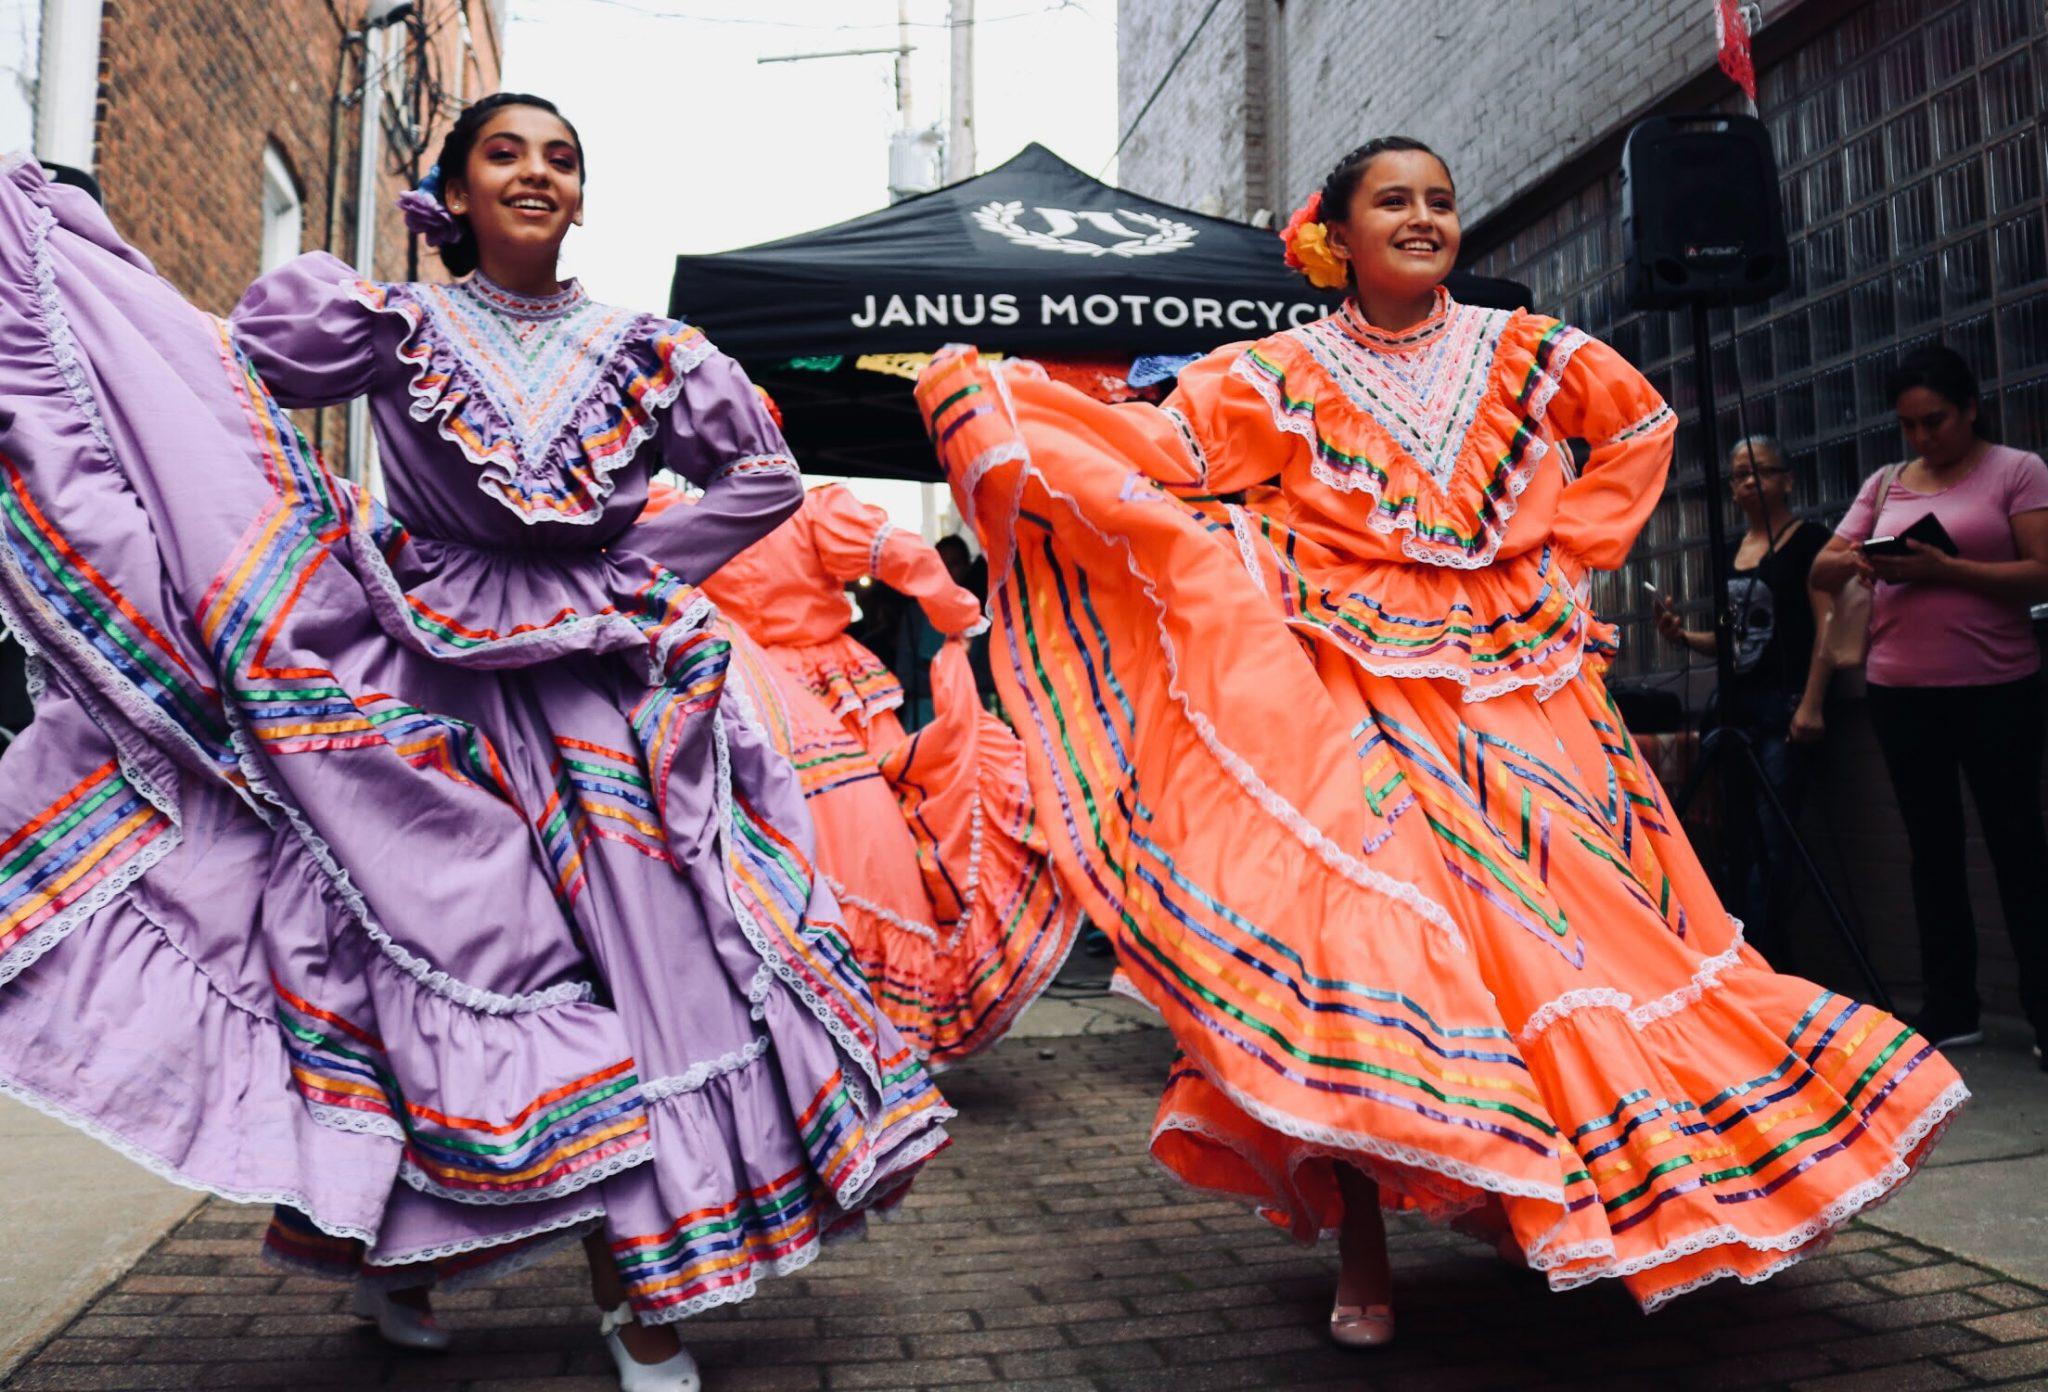 women in street dancing | Mexico